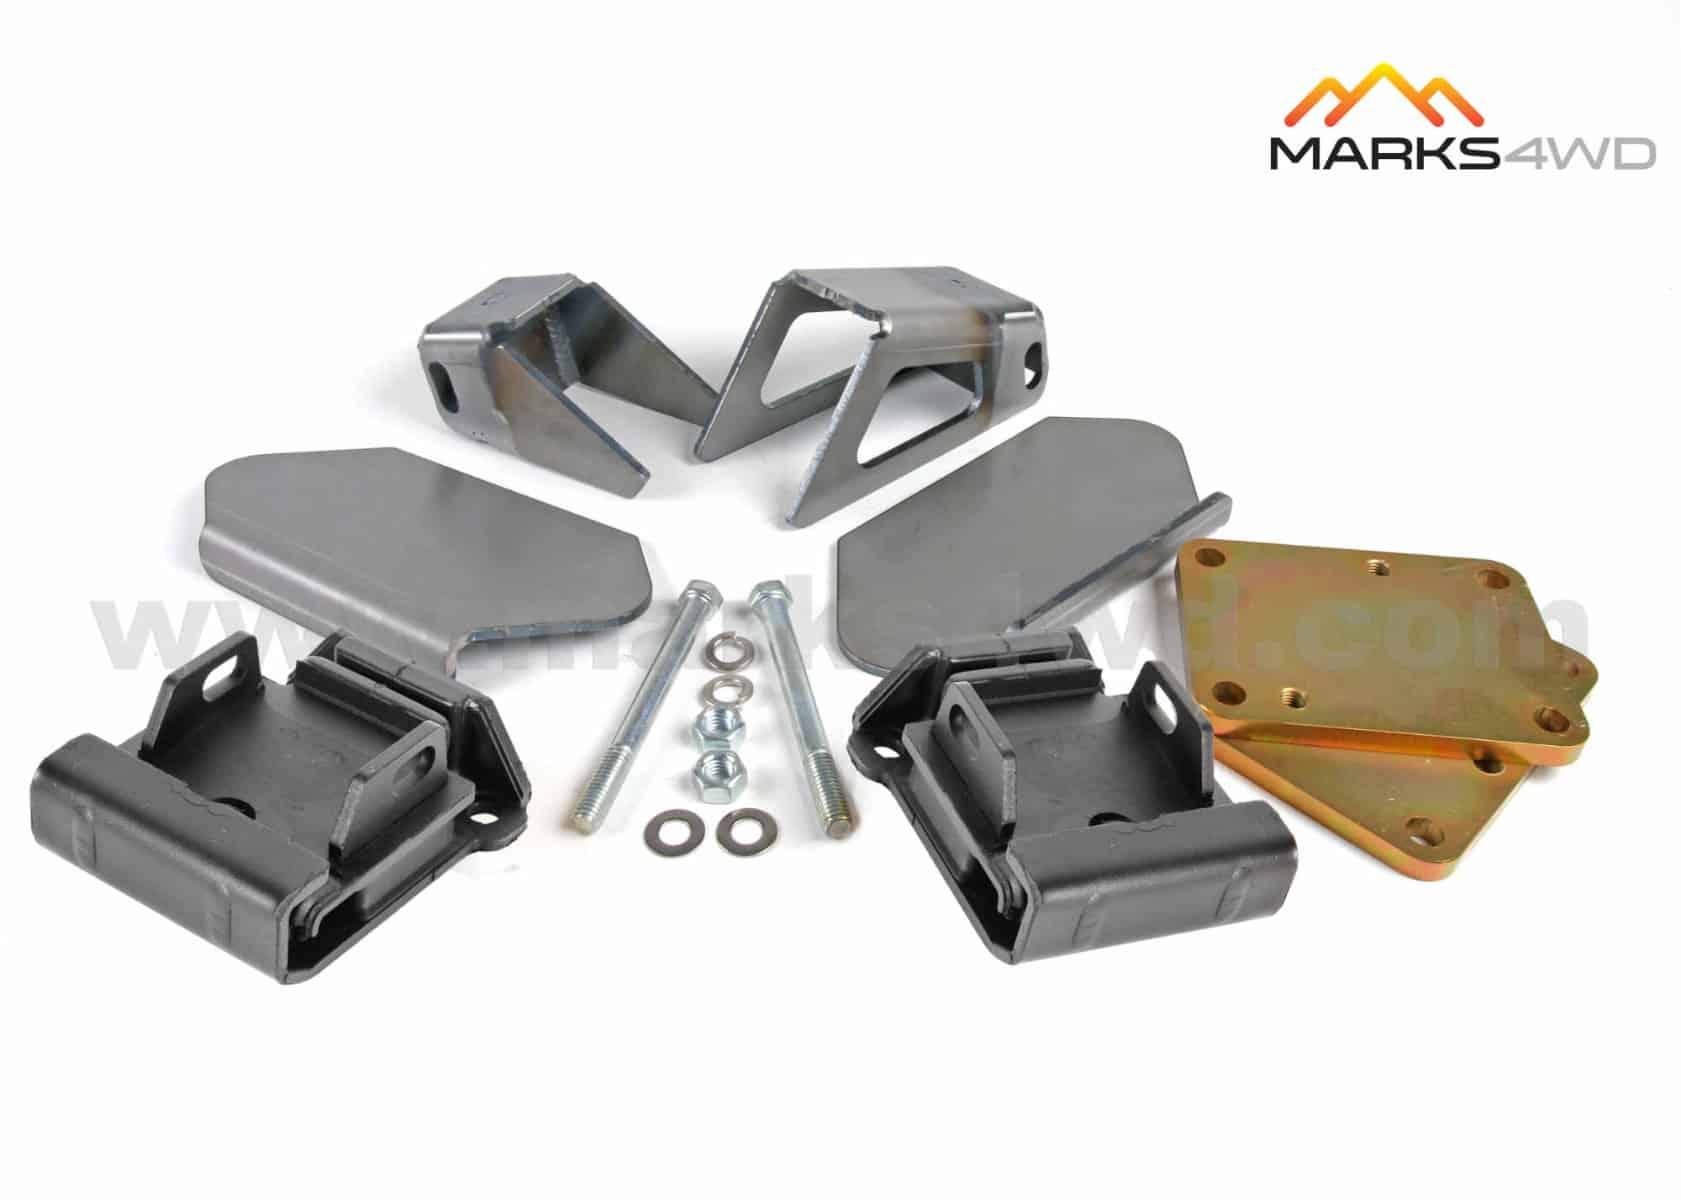 Engine mount kit - LS series V8 to LandCruiser 70 series